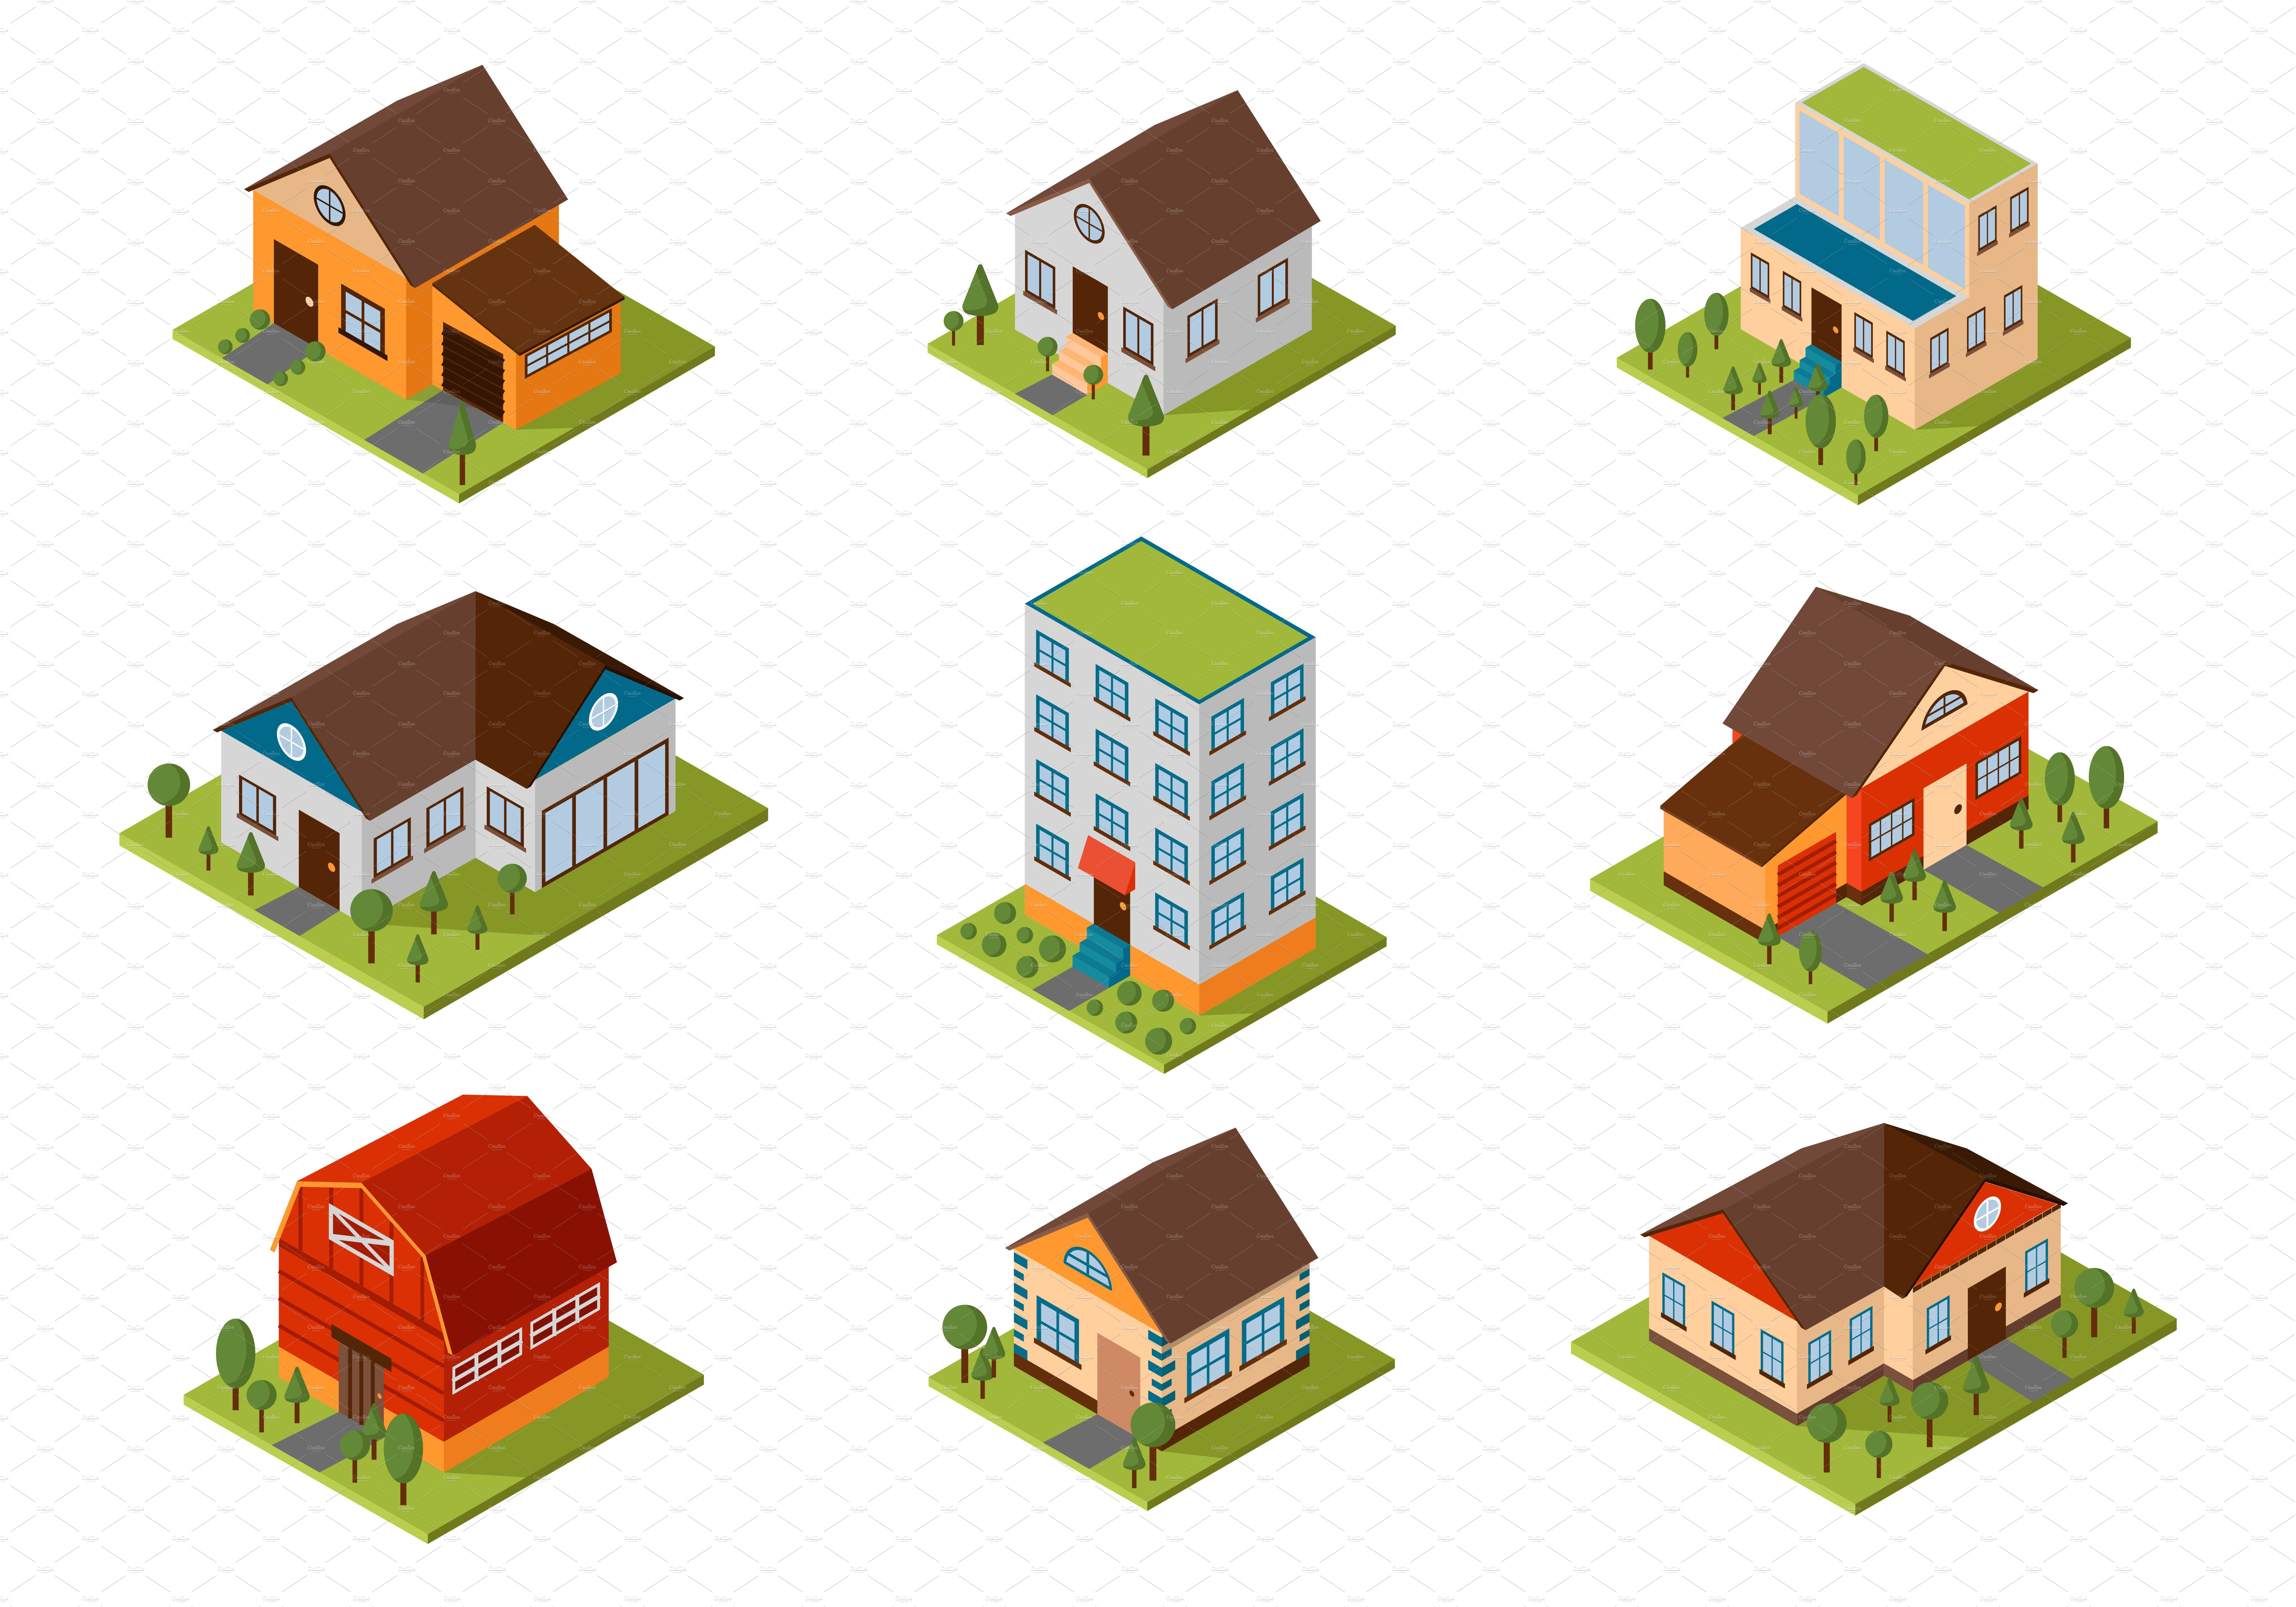 Isometric House Vector Illustration Illustrations